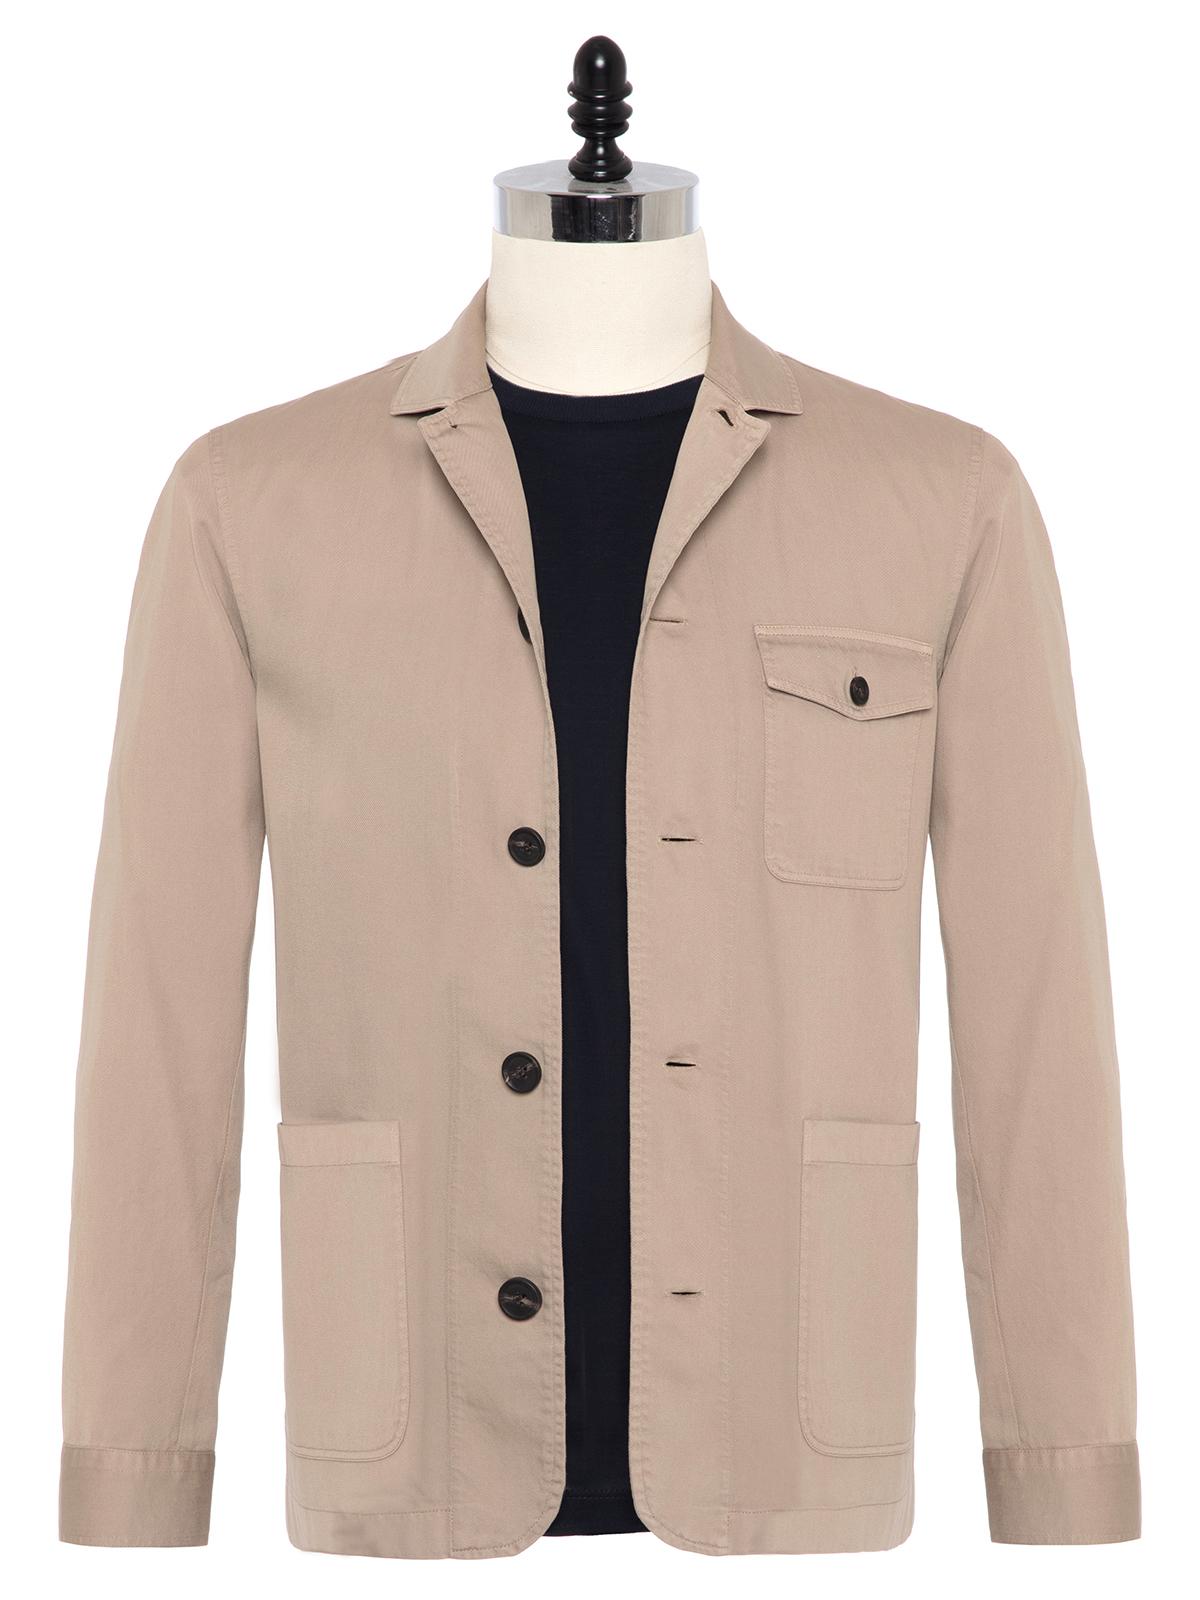 Germirli - Germirli Bej Twill Vintage Tailor Fit Ceket Gömlek